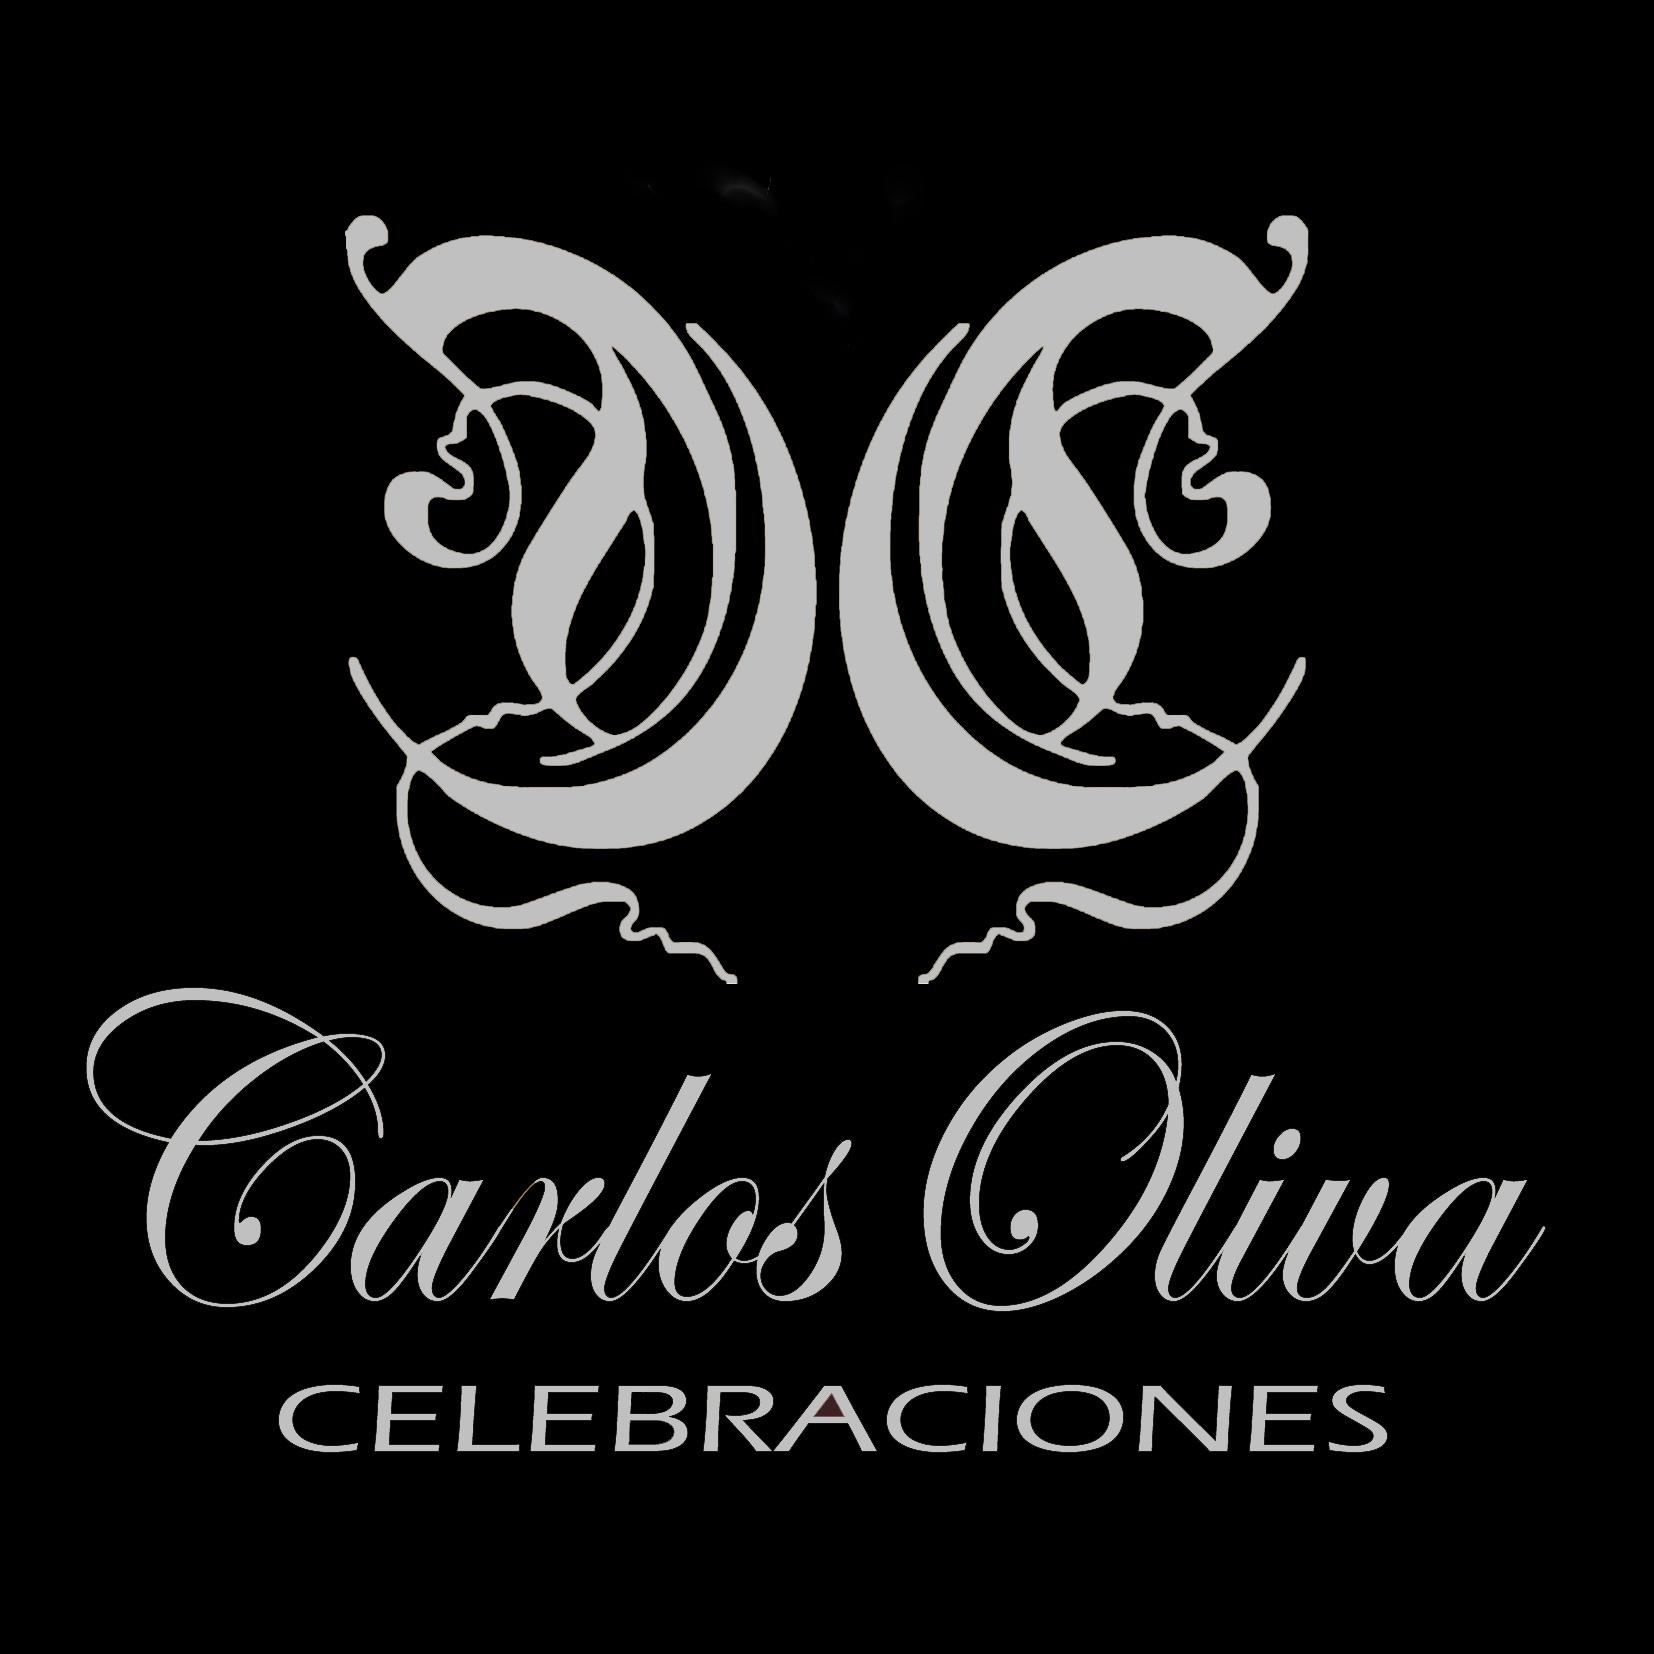 Carlos Oliva Celebraciones